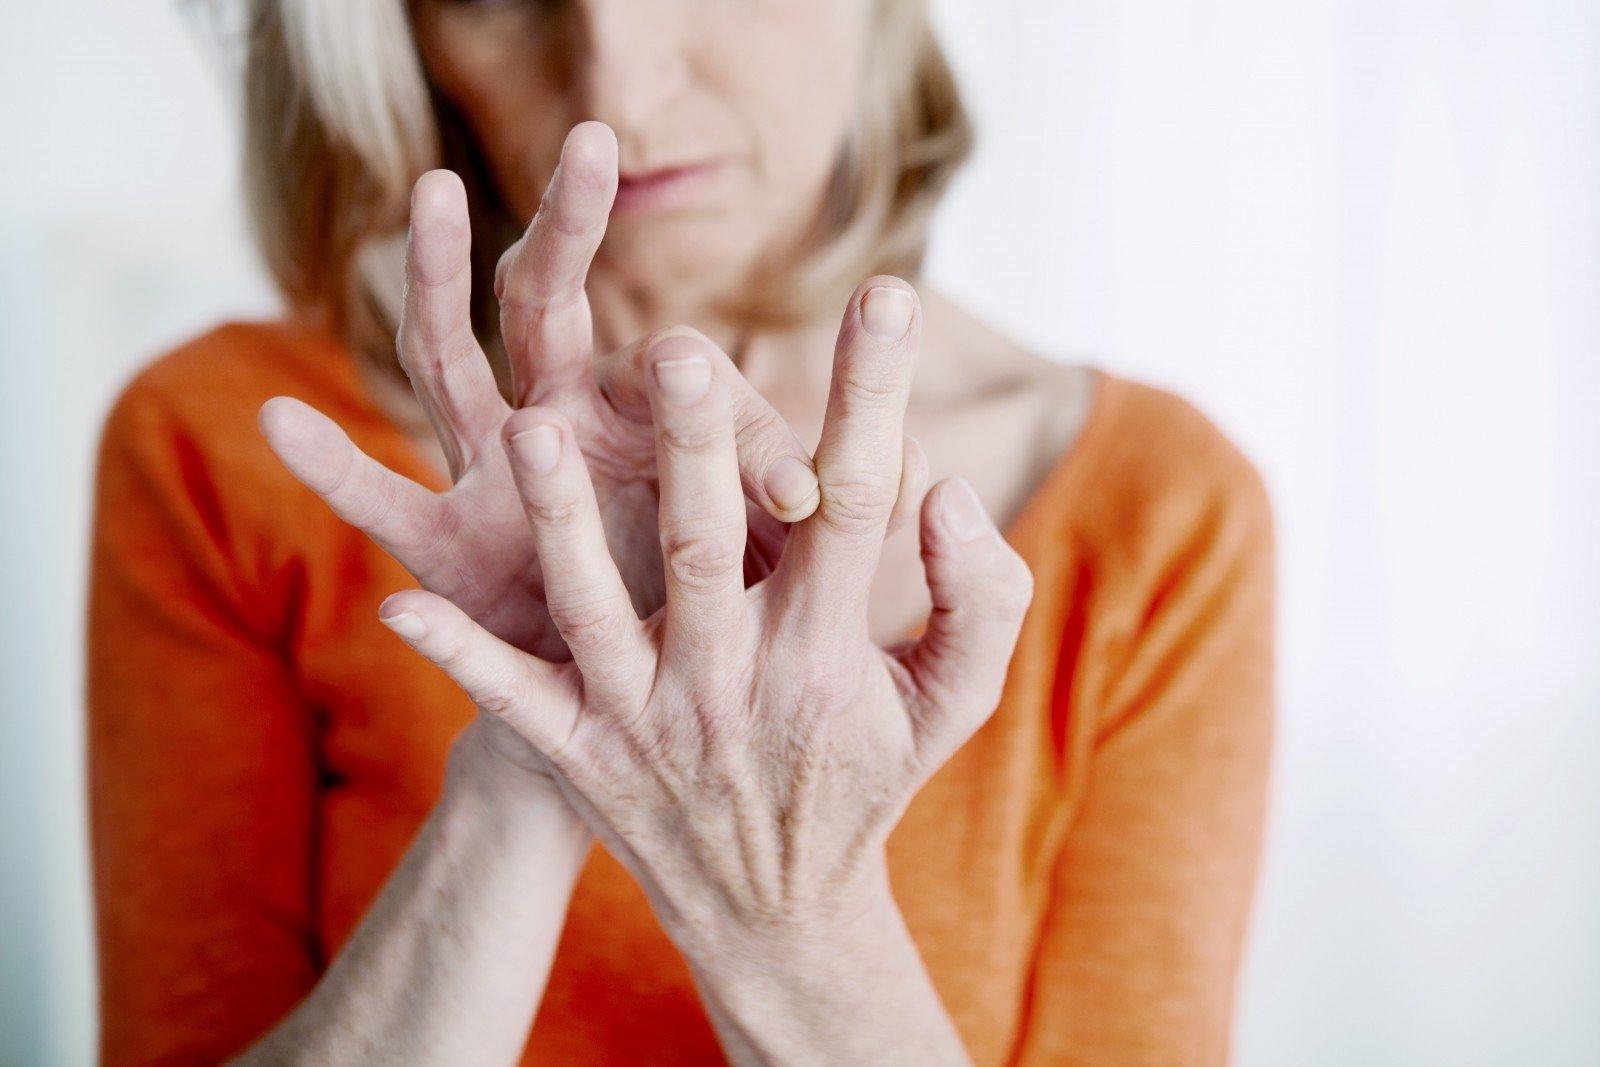 pirmieji požymiai artritu ir artrozės sąnarių